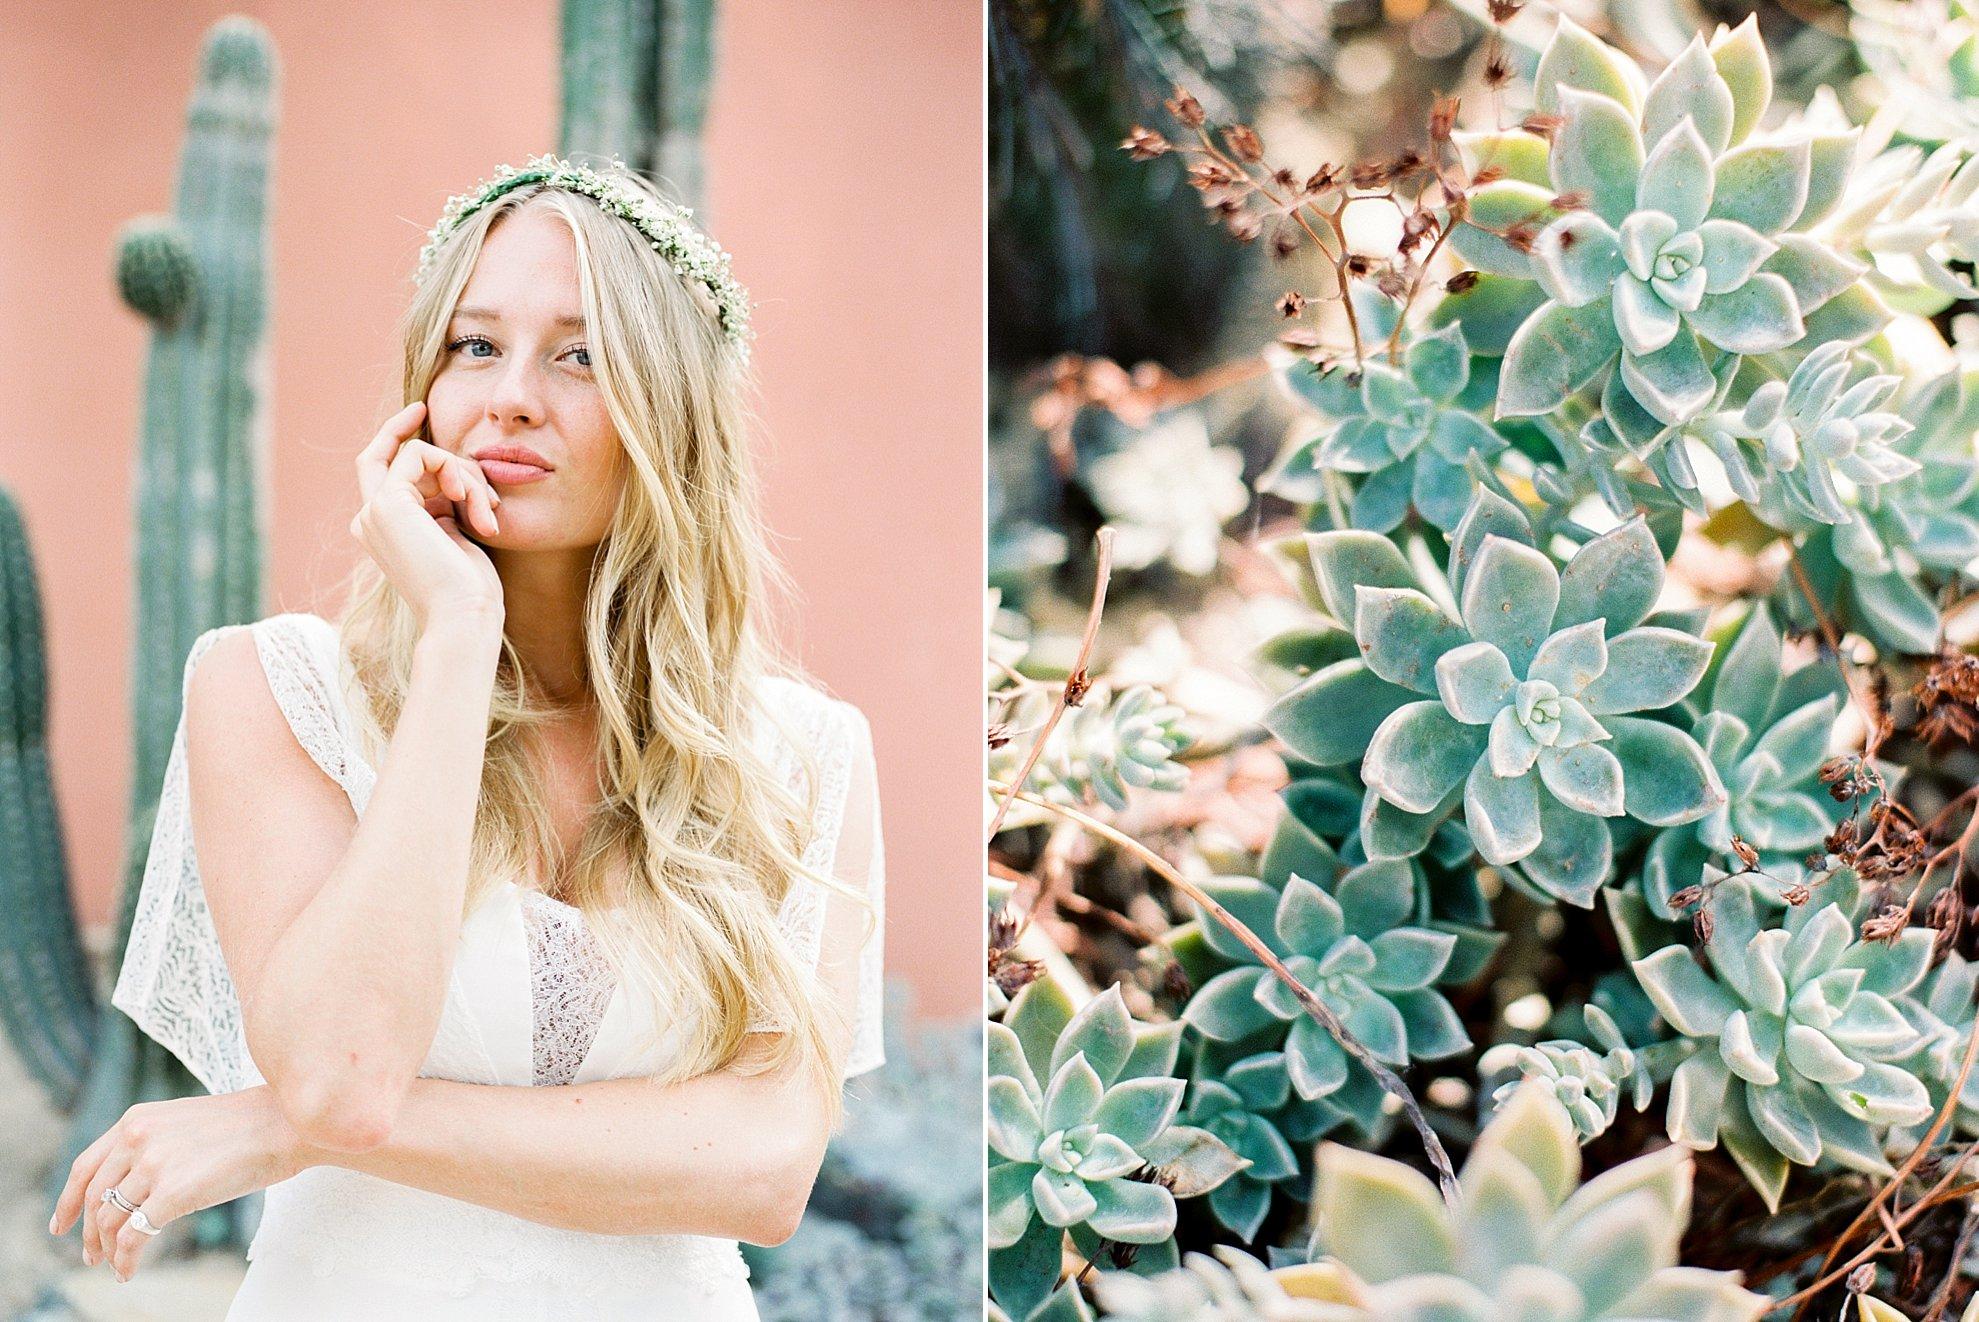 Amanda-Drost-photography-Hortus-Amsterdam-wedding_0004.jpg